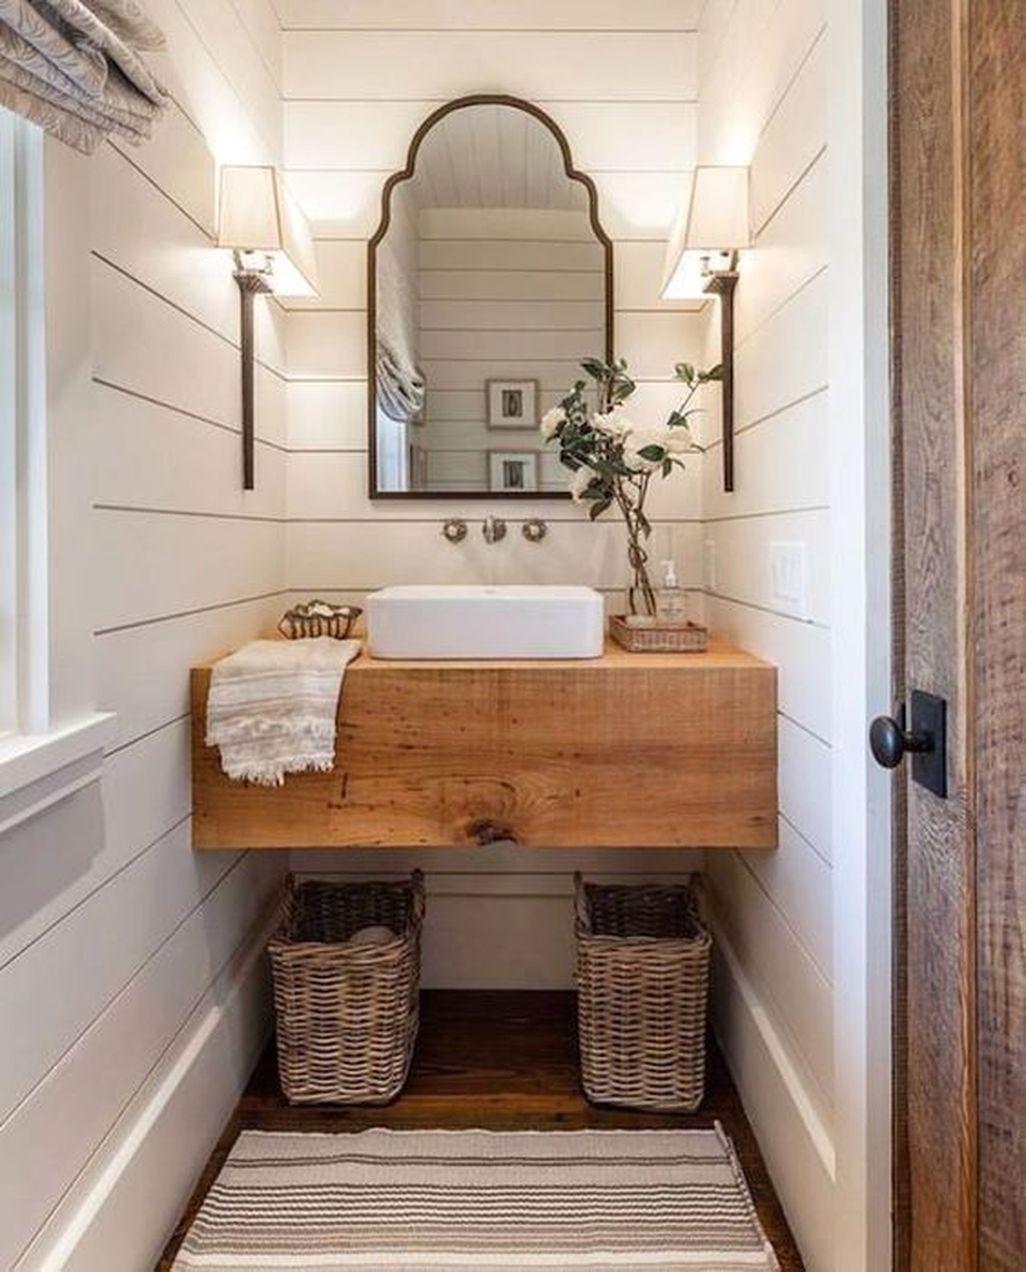 46 Awesome Small Powder Room Design Ideas Powder Room